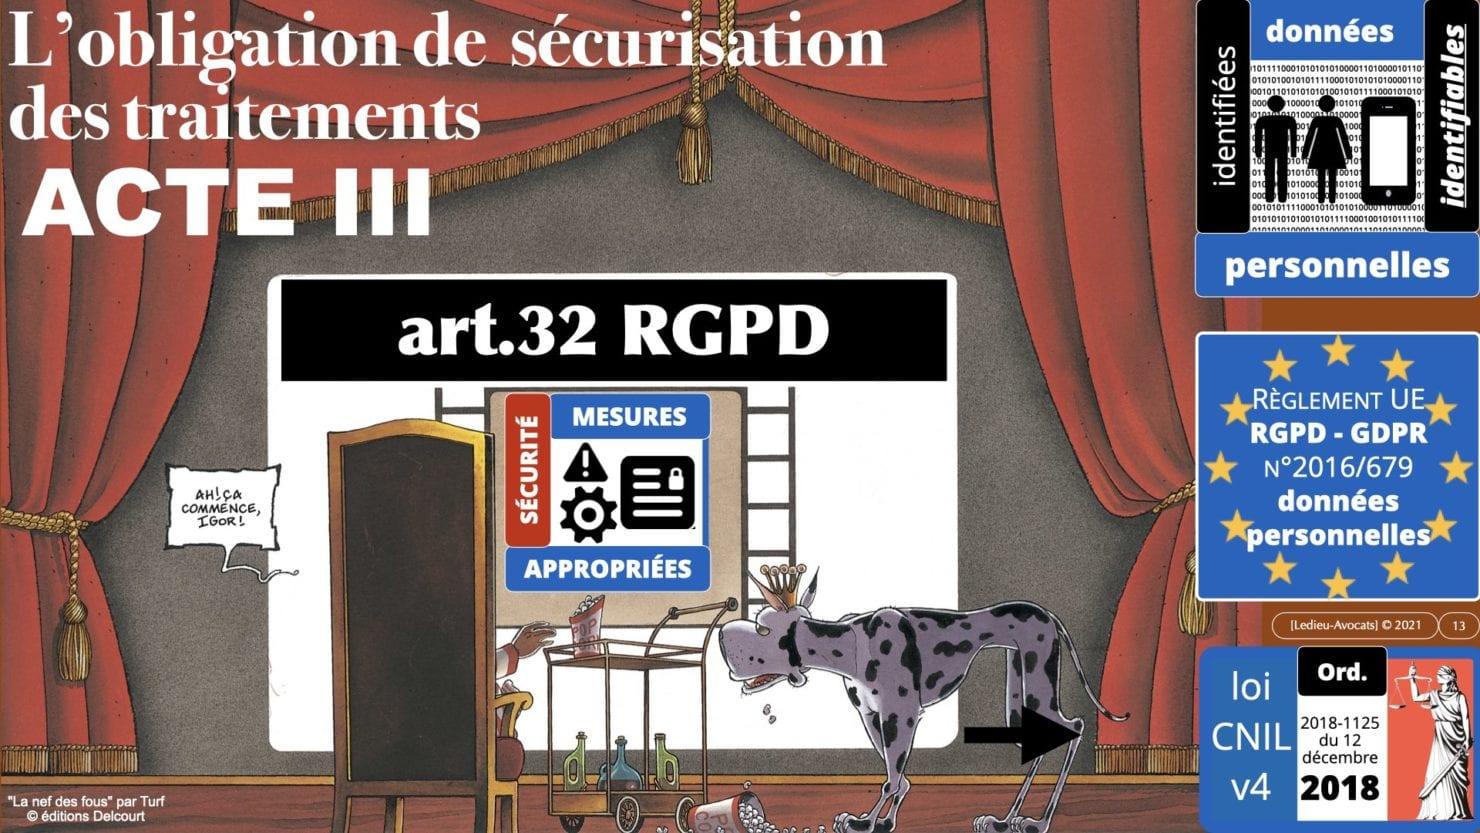 337 cyber sécurité #1 OIV OSE Critical Entities © Ledieu-avocat 15-06-2021.013